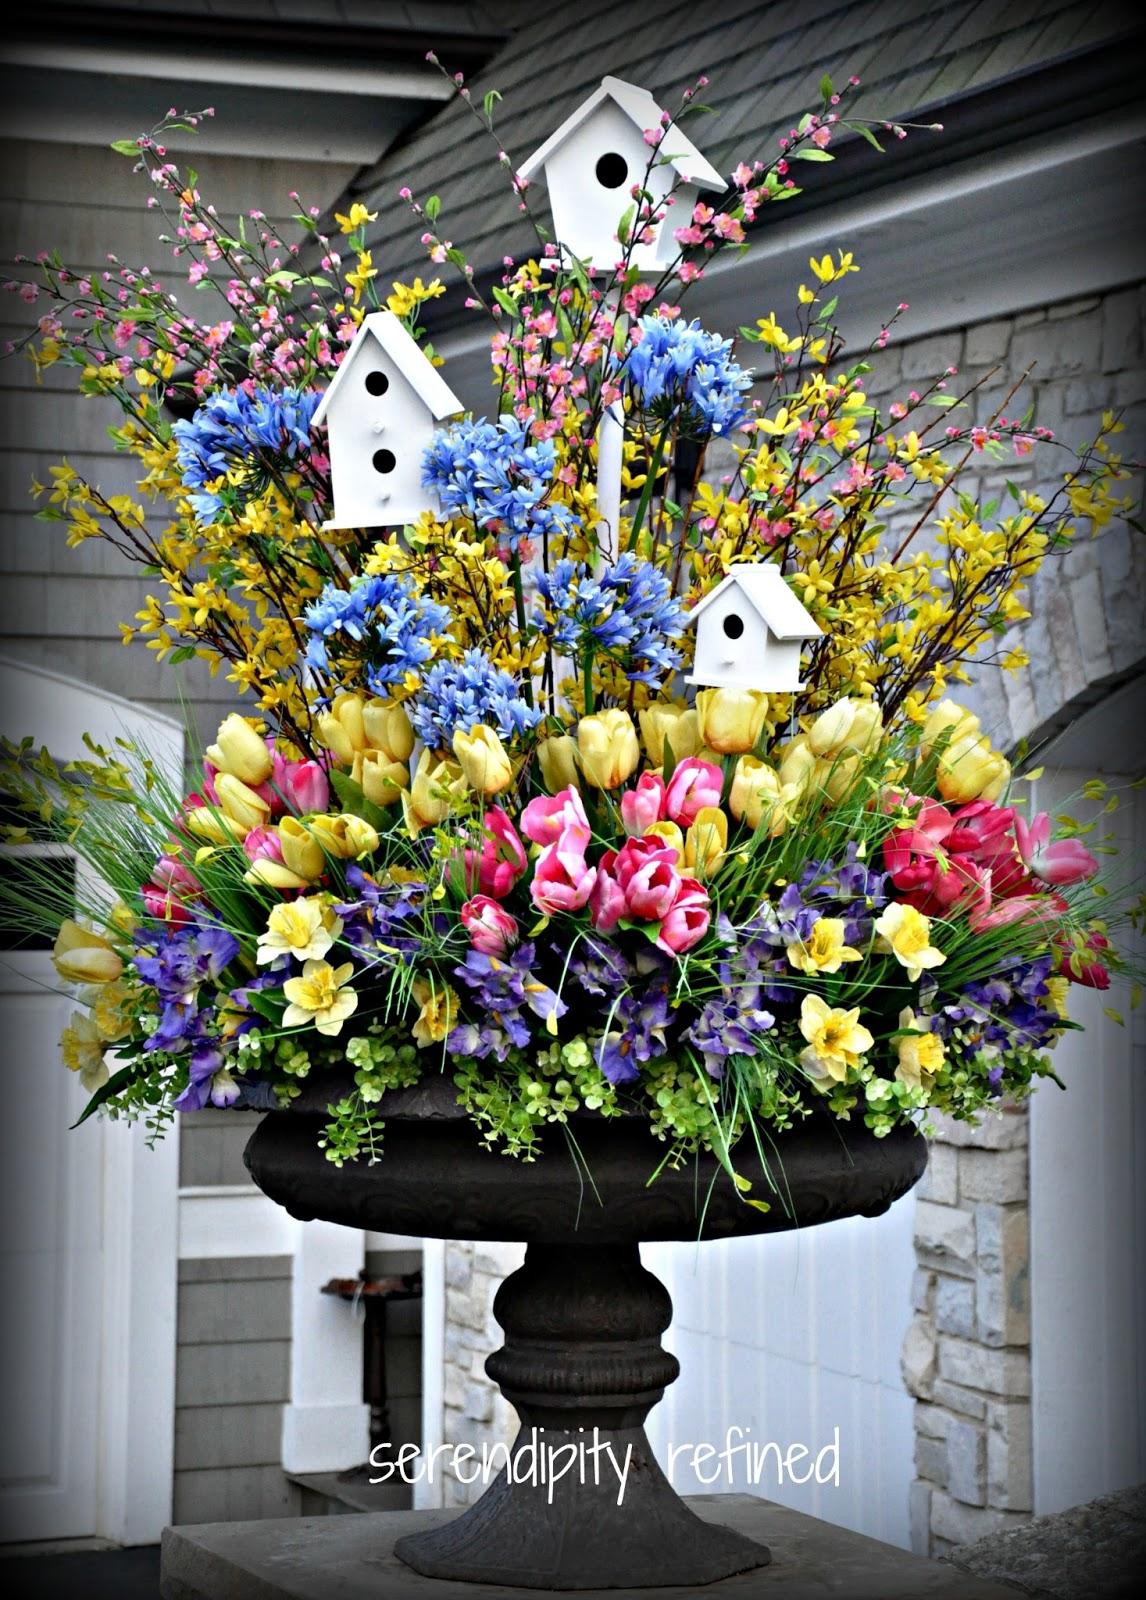 Serendipity Refined Blog Spring Urn Planter Tulips